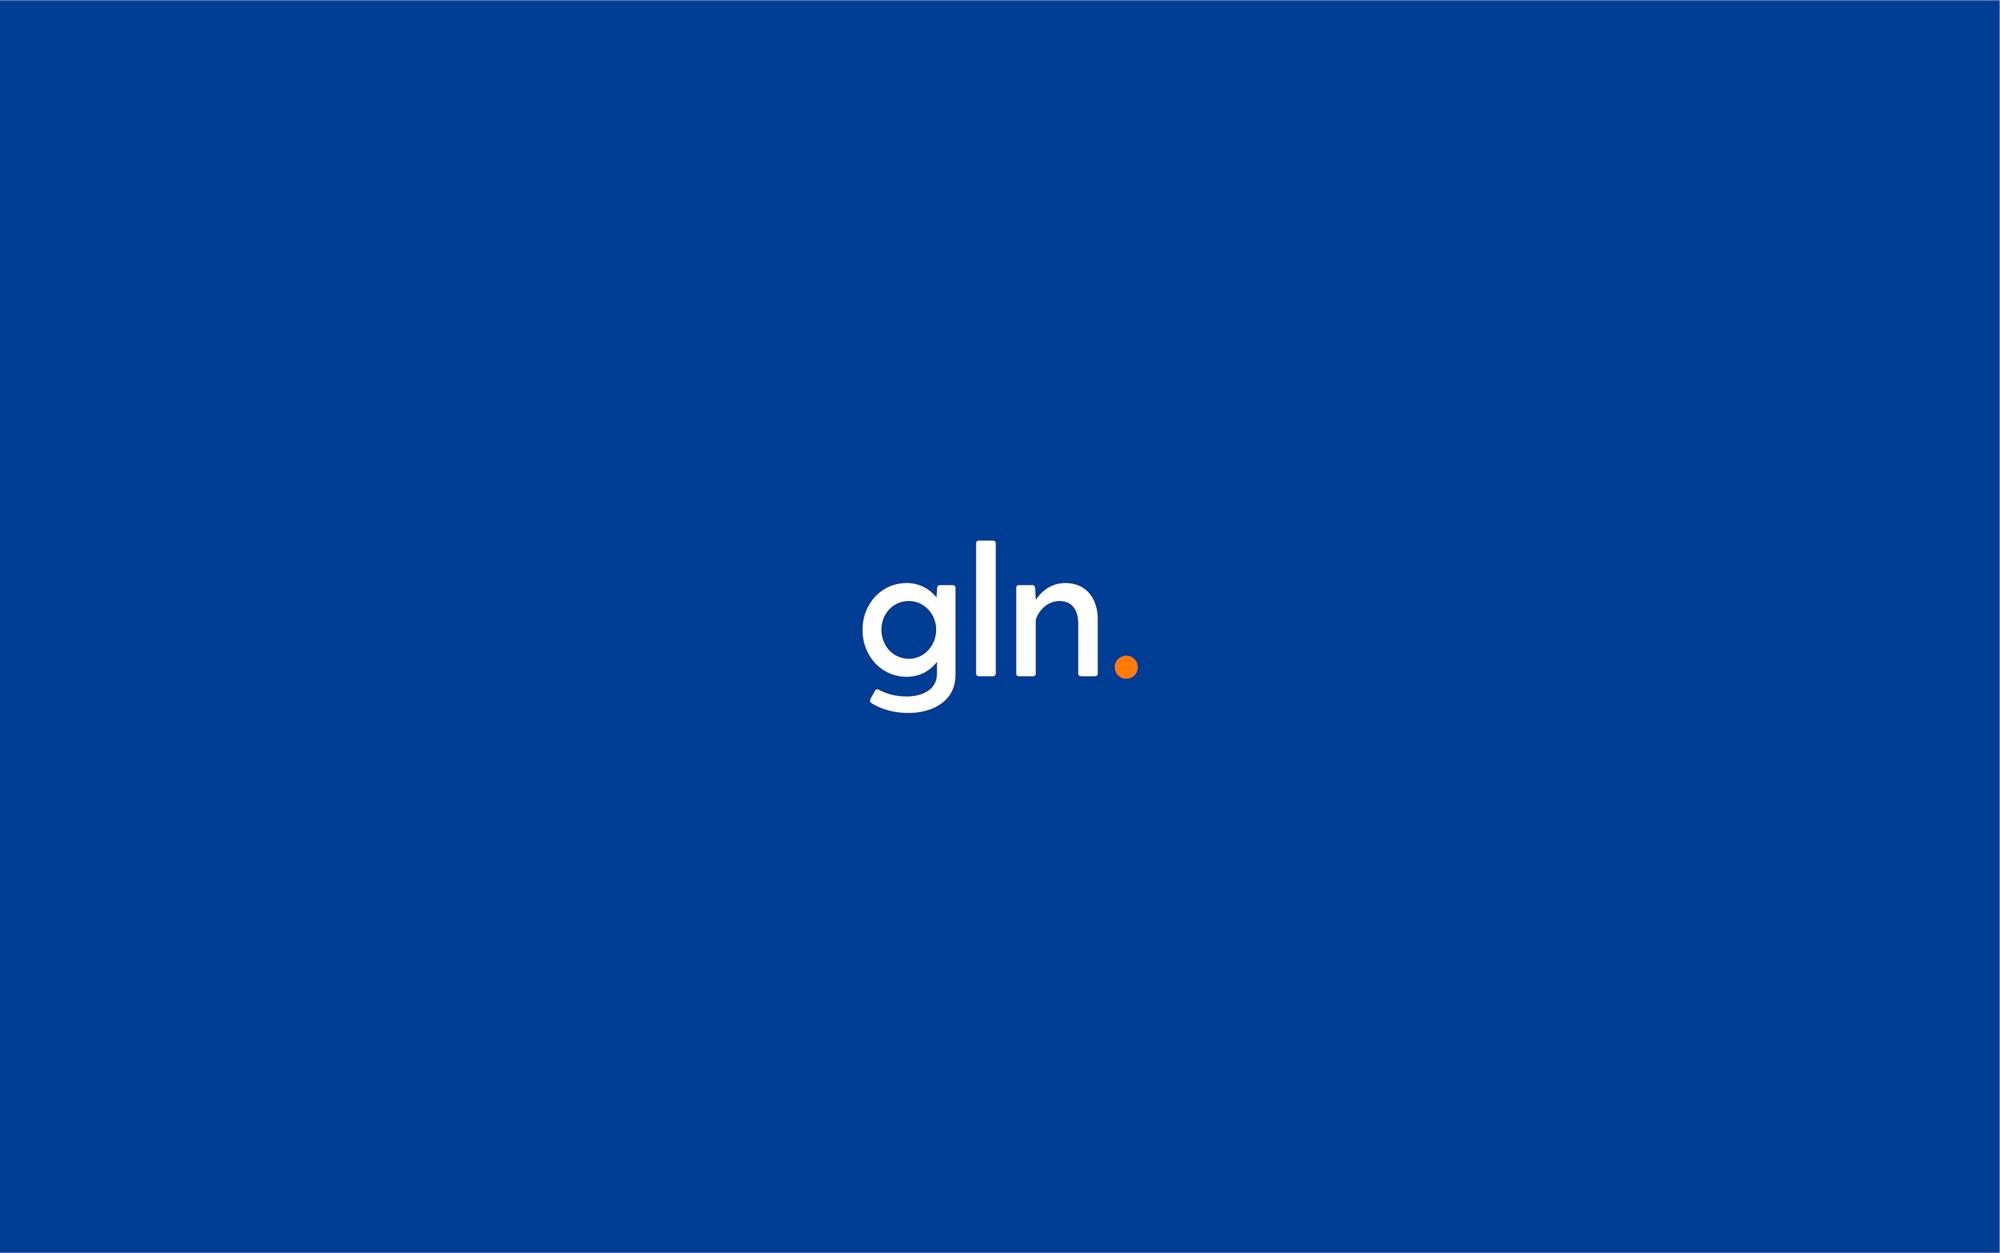 GLN_planning-design-branding-studio-1